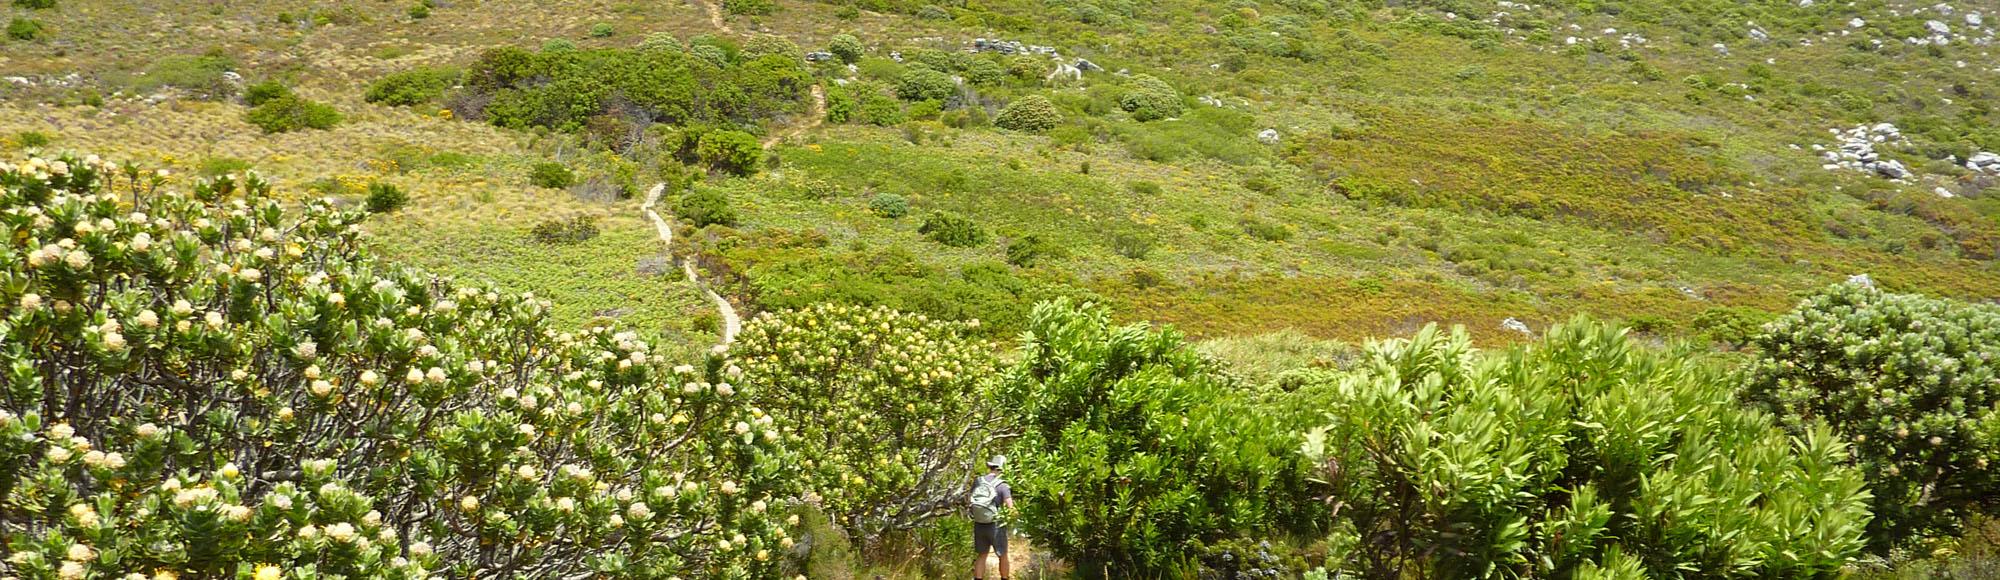 Table Mountain hike 01i